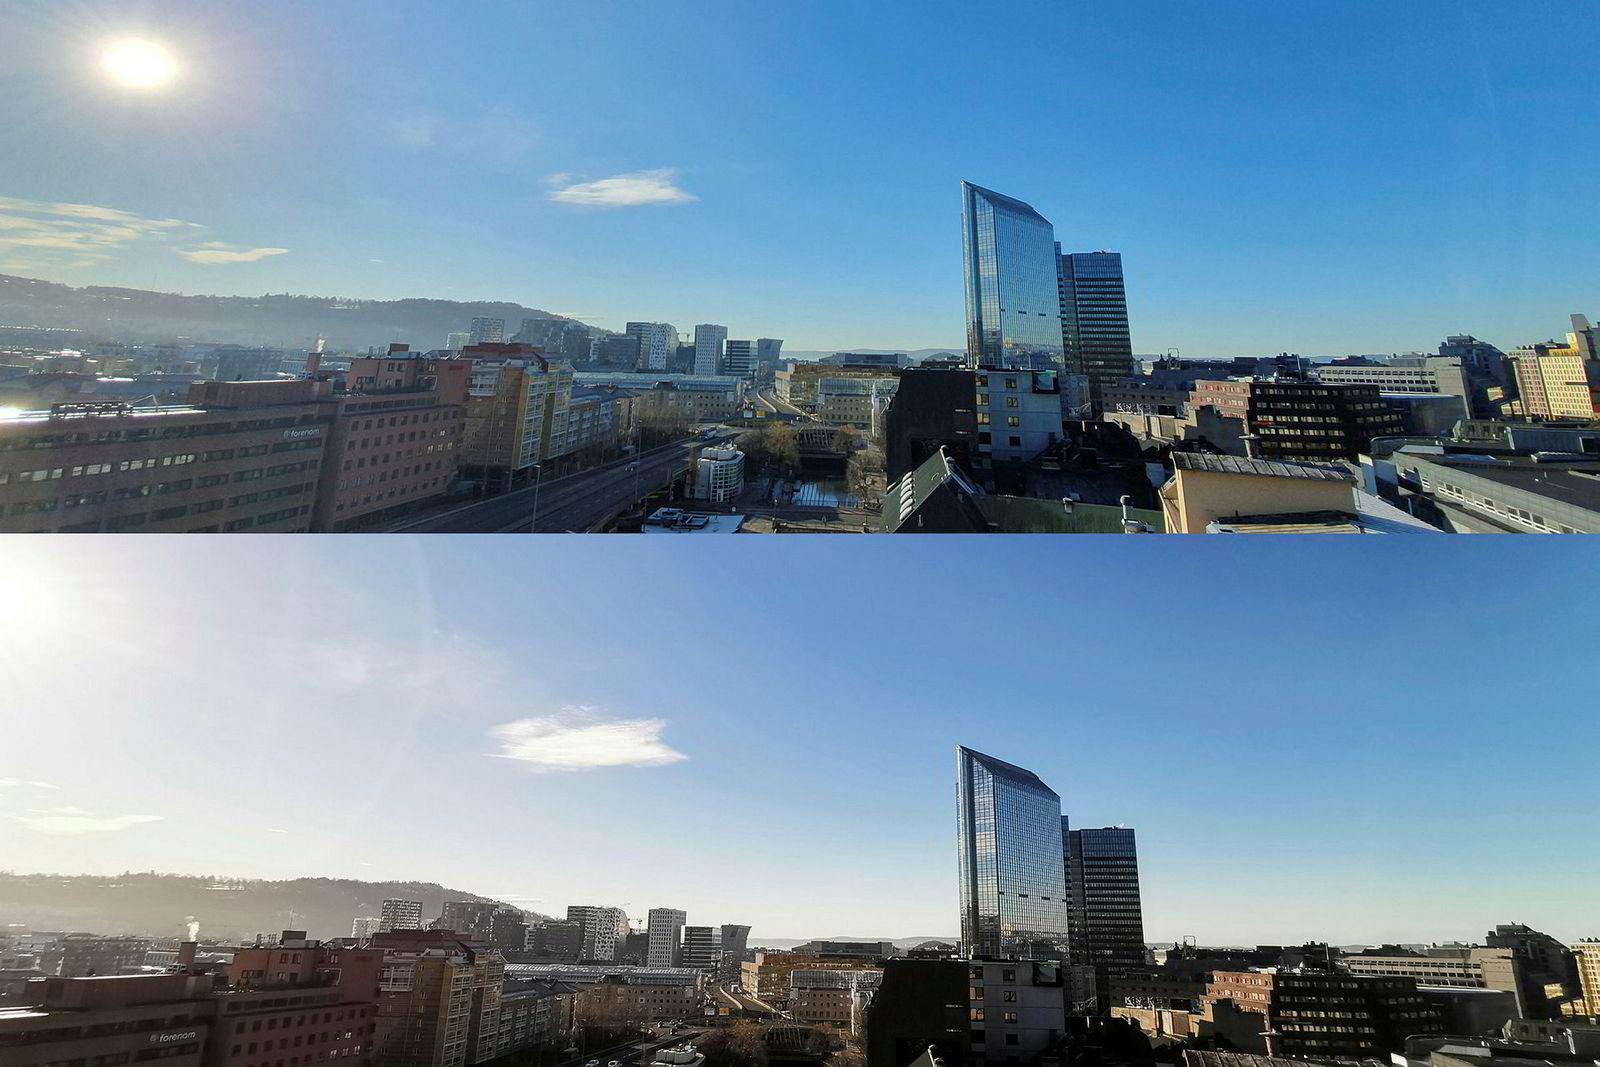 Ultra vidvinkel kan gi fine landskapsbilder. Galaxy S10+ øverst, Huawei Mate 20 Pro nederst.